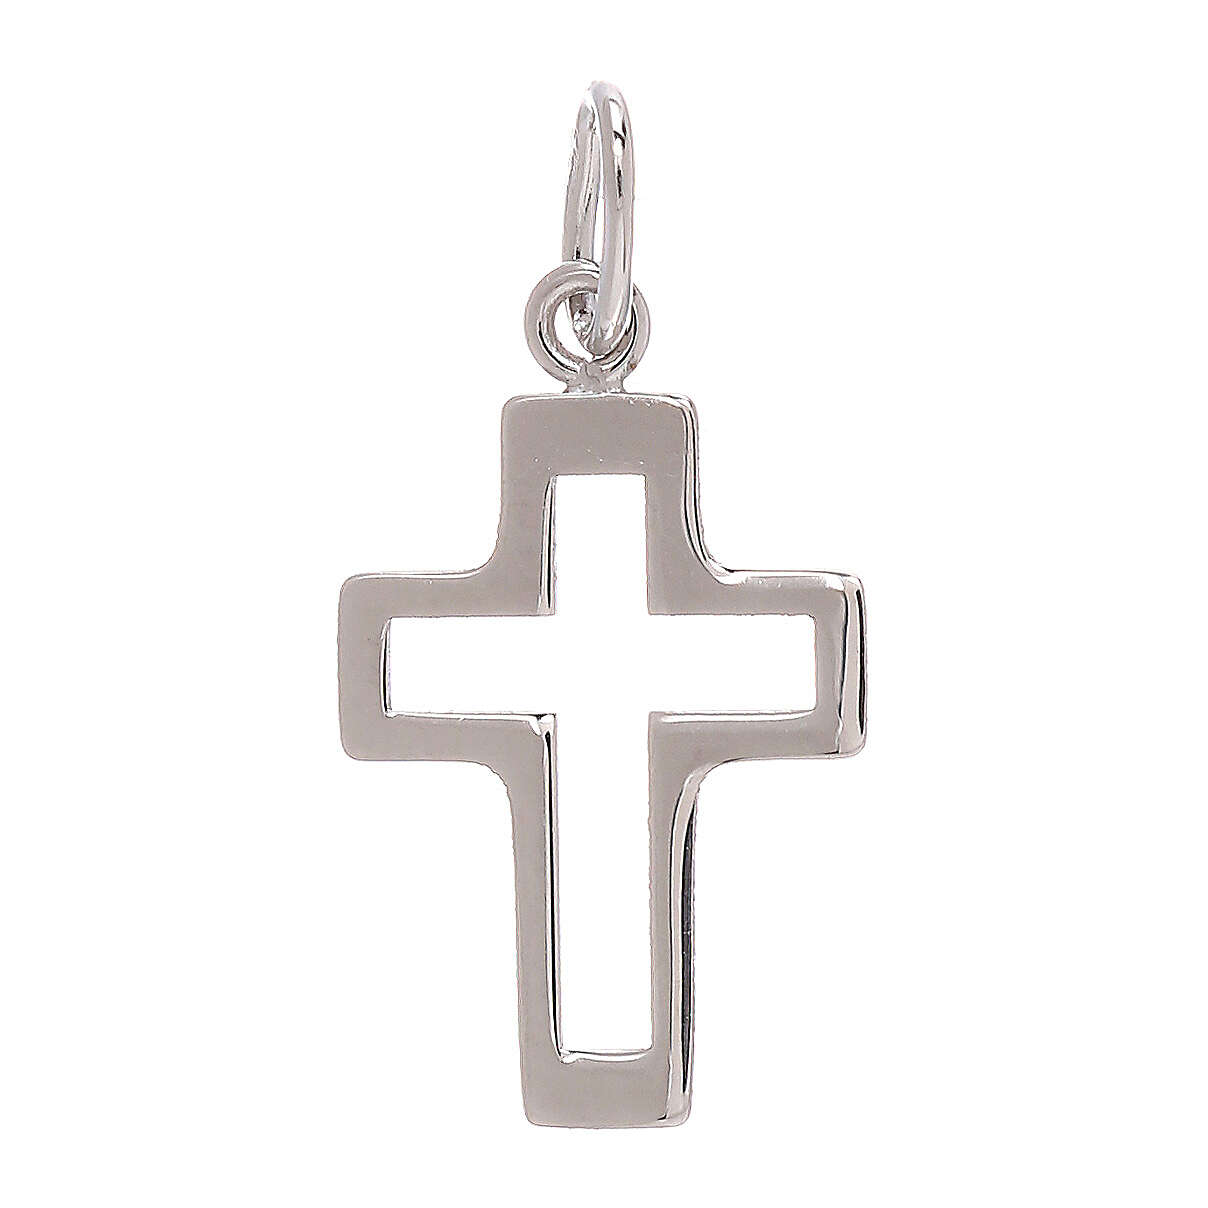 Colgante cruz perforada oro blanco 750/00 0,35 gr 4